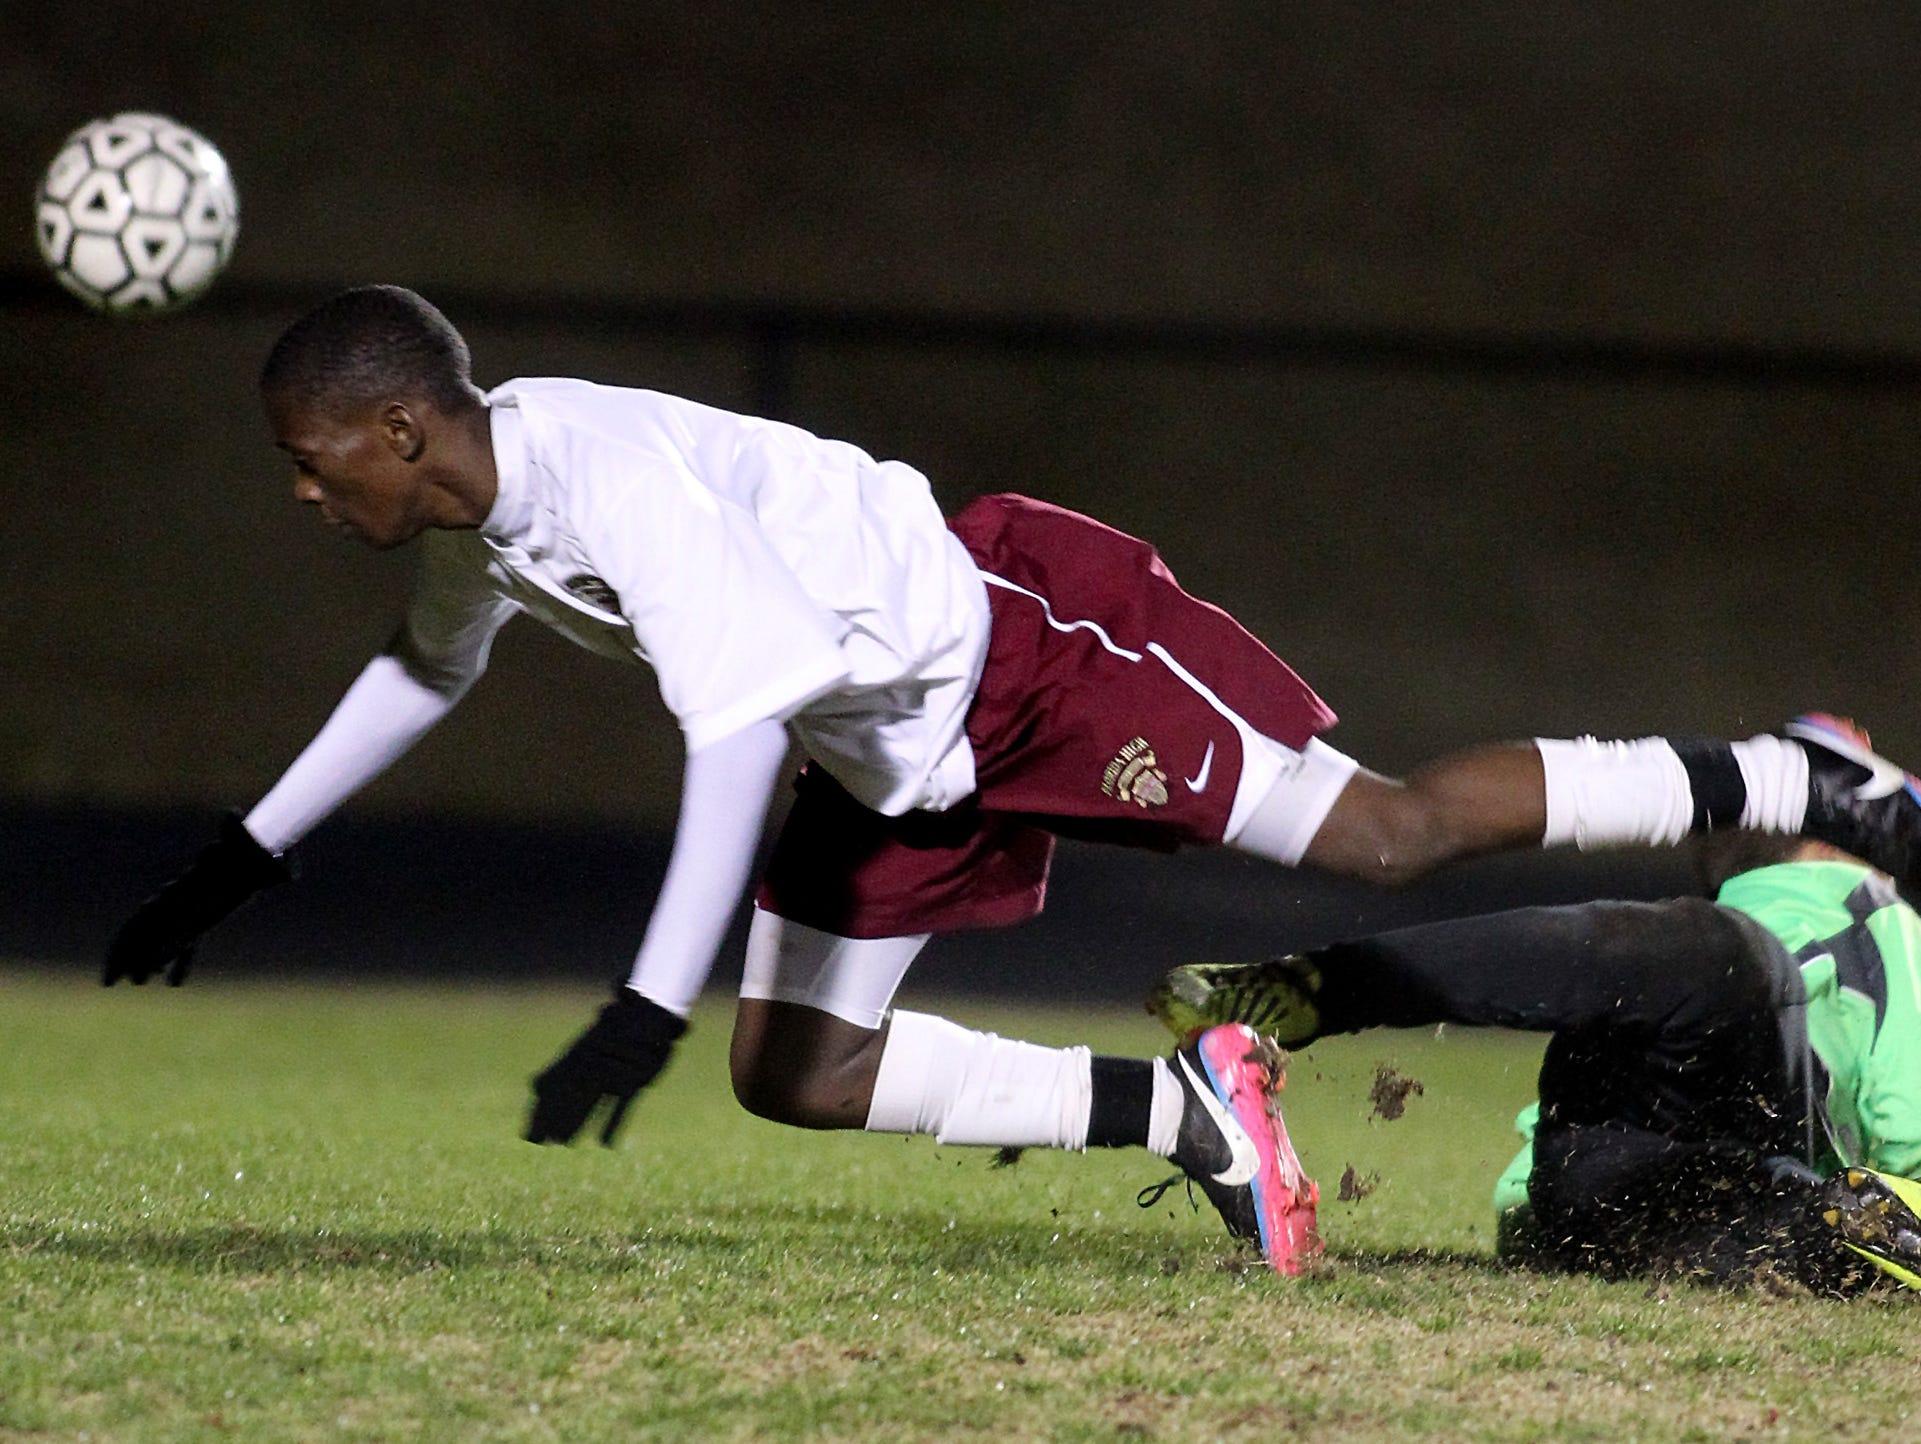 Florida High will miss the veteran presence of midfielder David Mkoji, but the Seminoles also return a lot of talent.